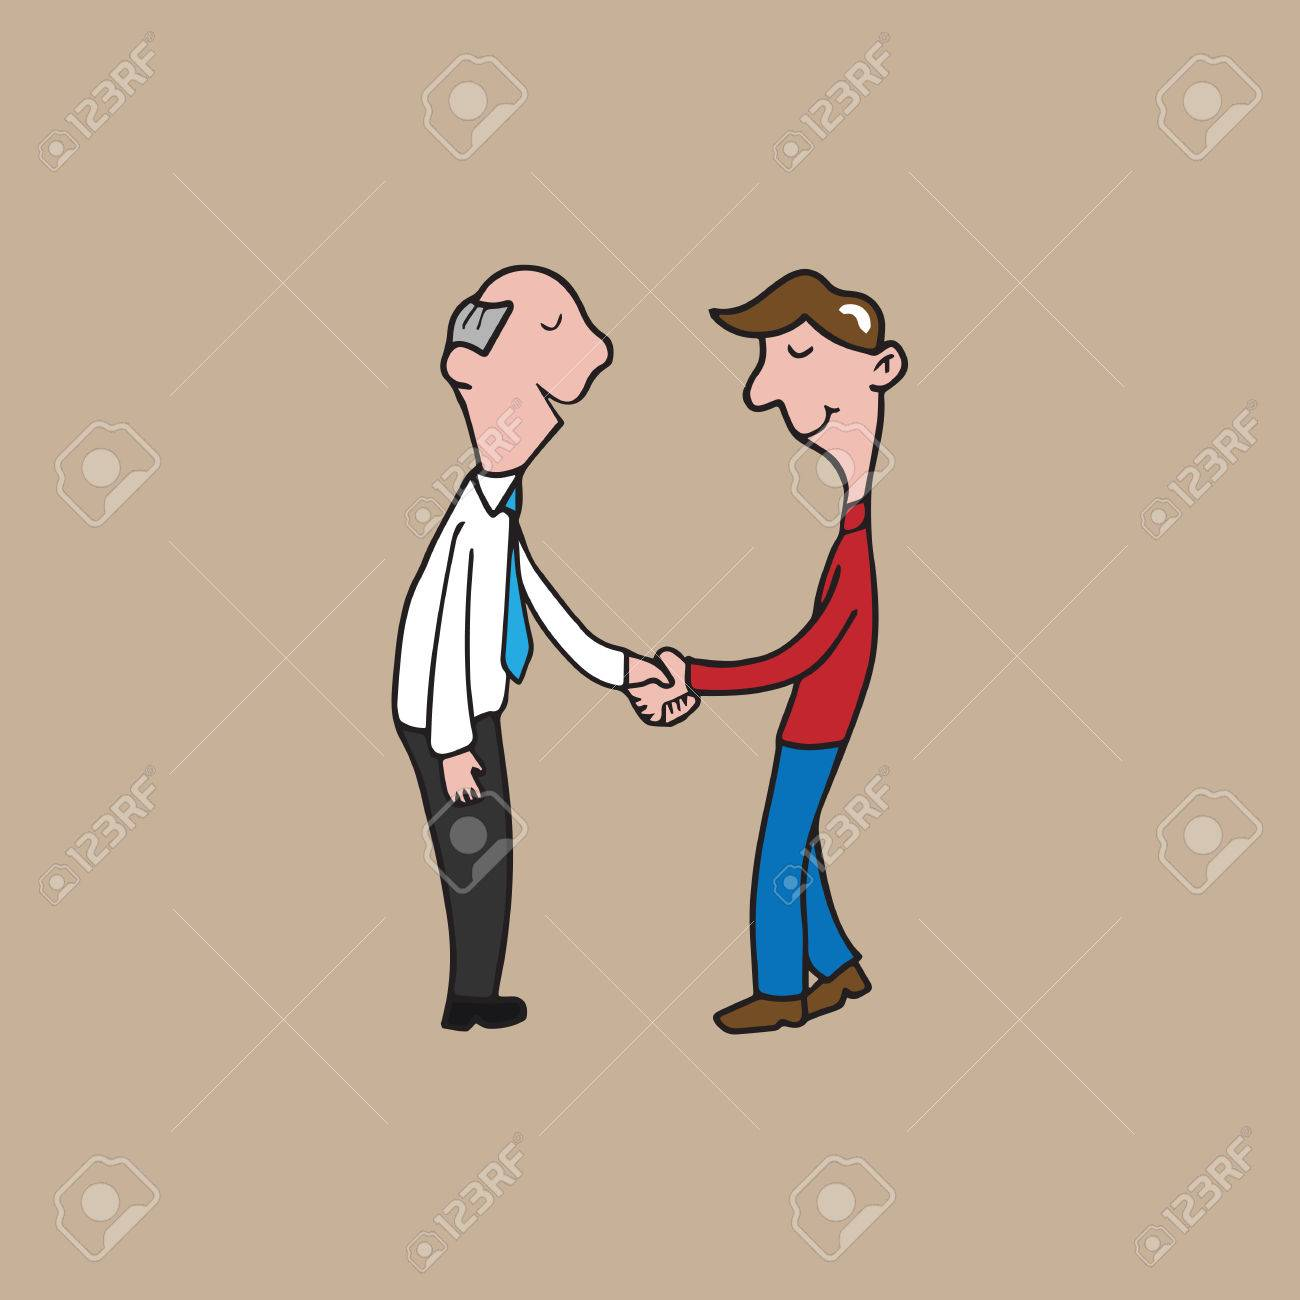 1300x1300 Men Handshake Cartoon Drawing Vector Royalty Free Cliparts